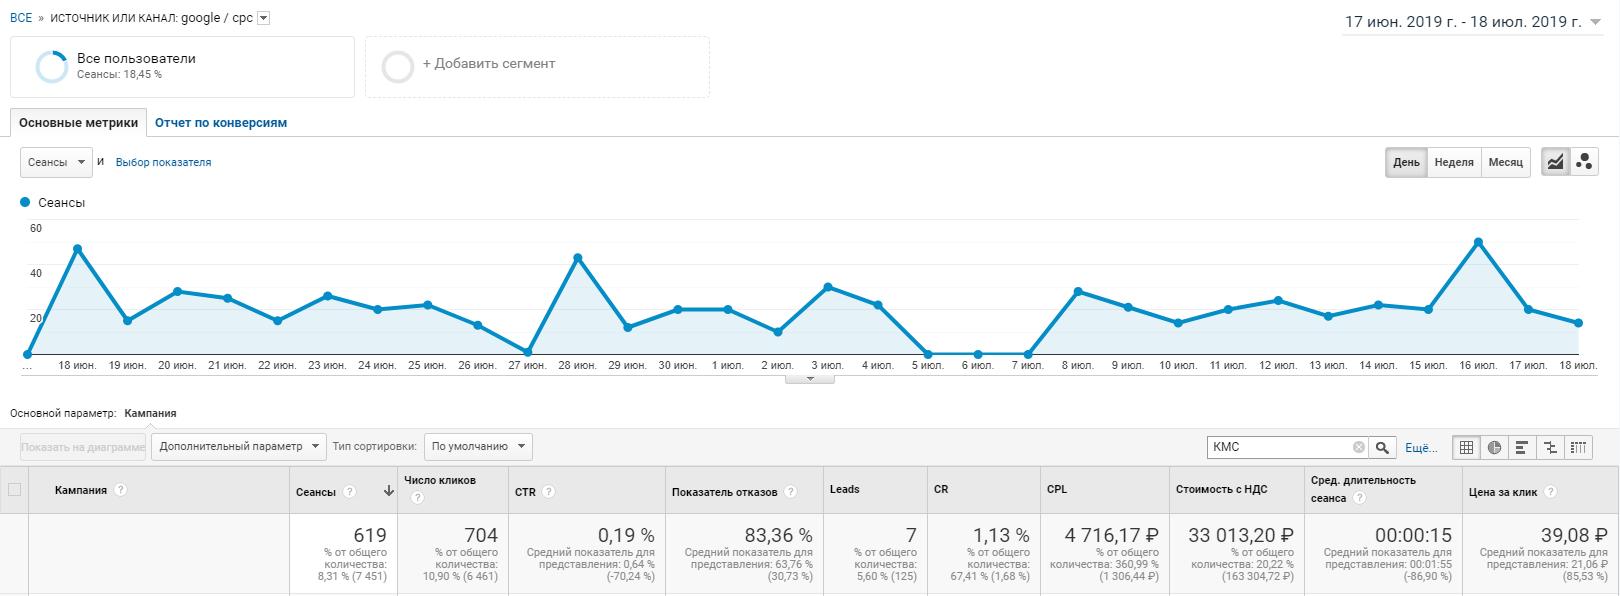 statistika_kampaniy_v_kms